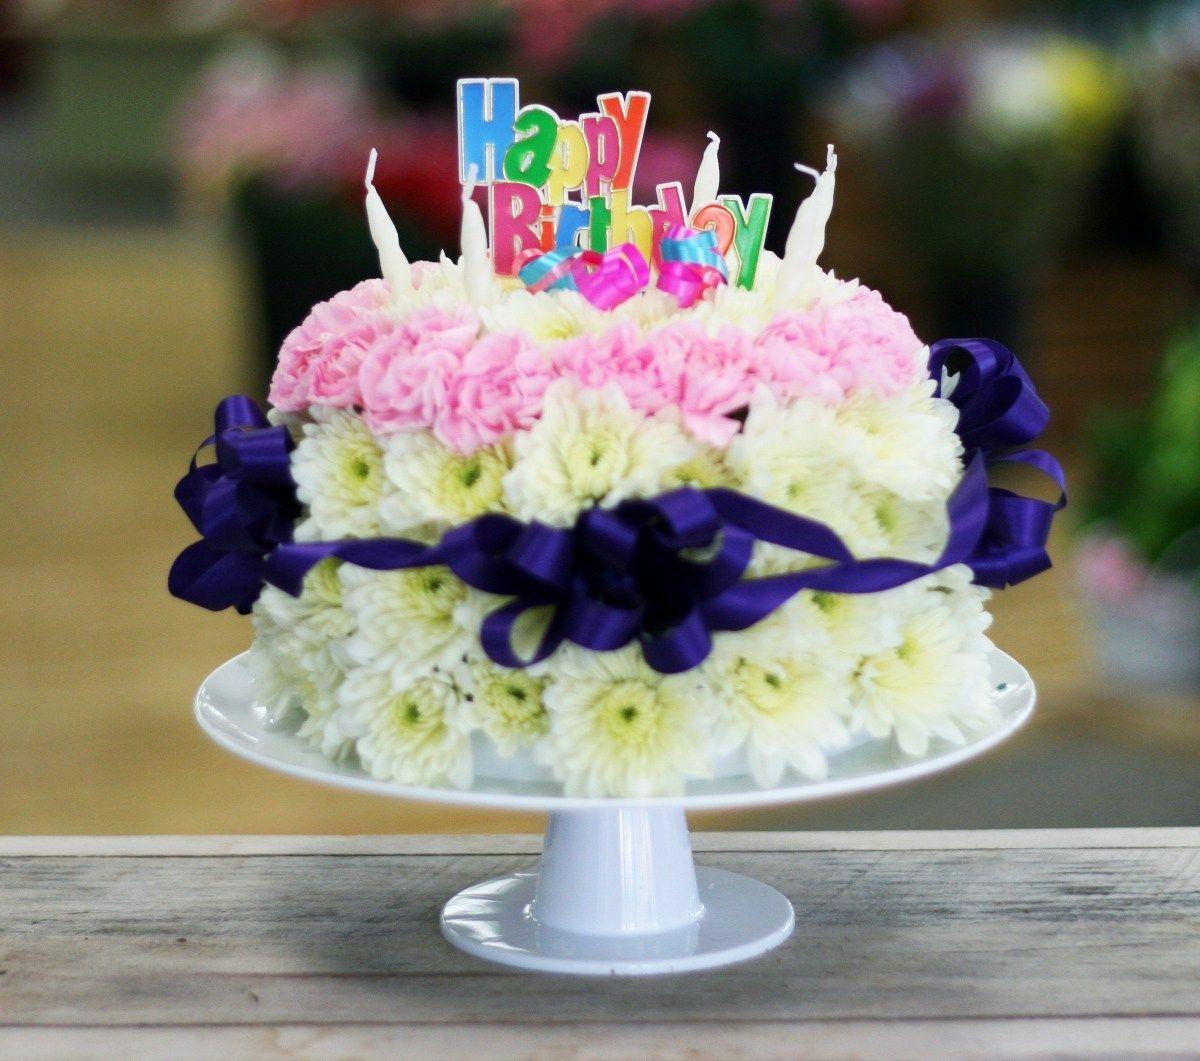 21 Wonderful Photo Of Birthday Cakes With Flowers Davemelillo Com Birthday Cake With Flowers Birthday Cake With Candles Birthday Cake With Photo